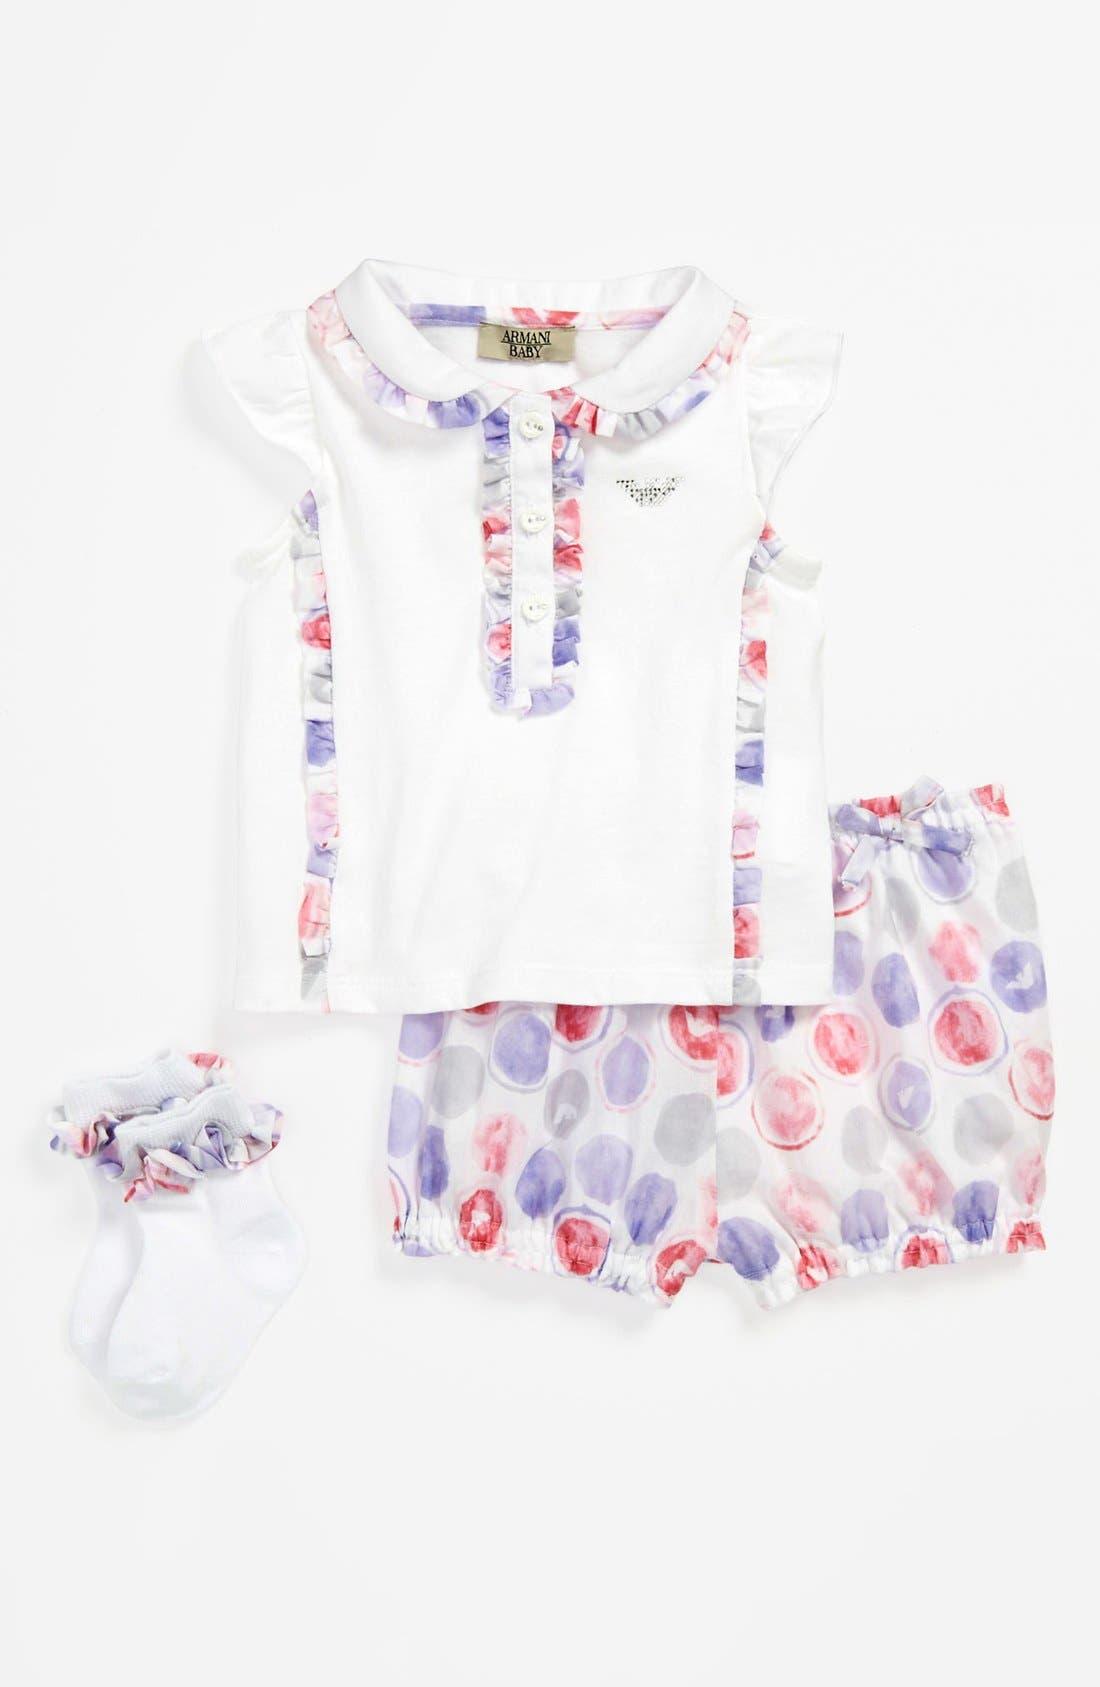 Alternate Image 1 Selected - Armani Junior Shirt, Pants & Socks (Baby Girls)